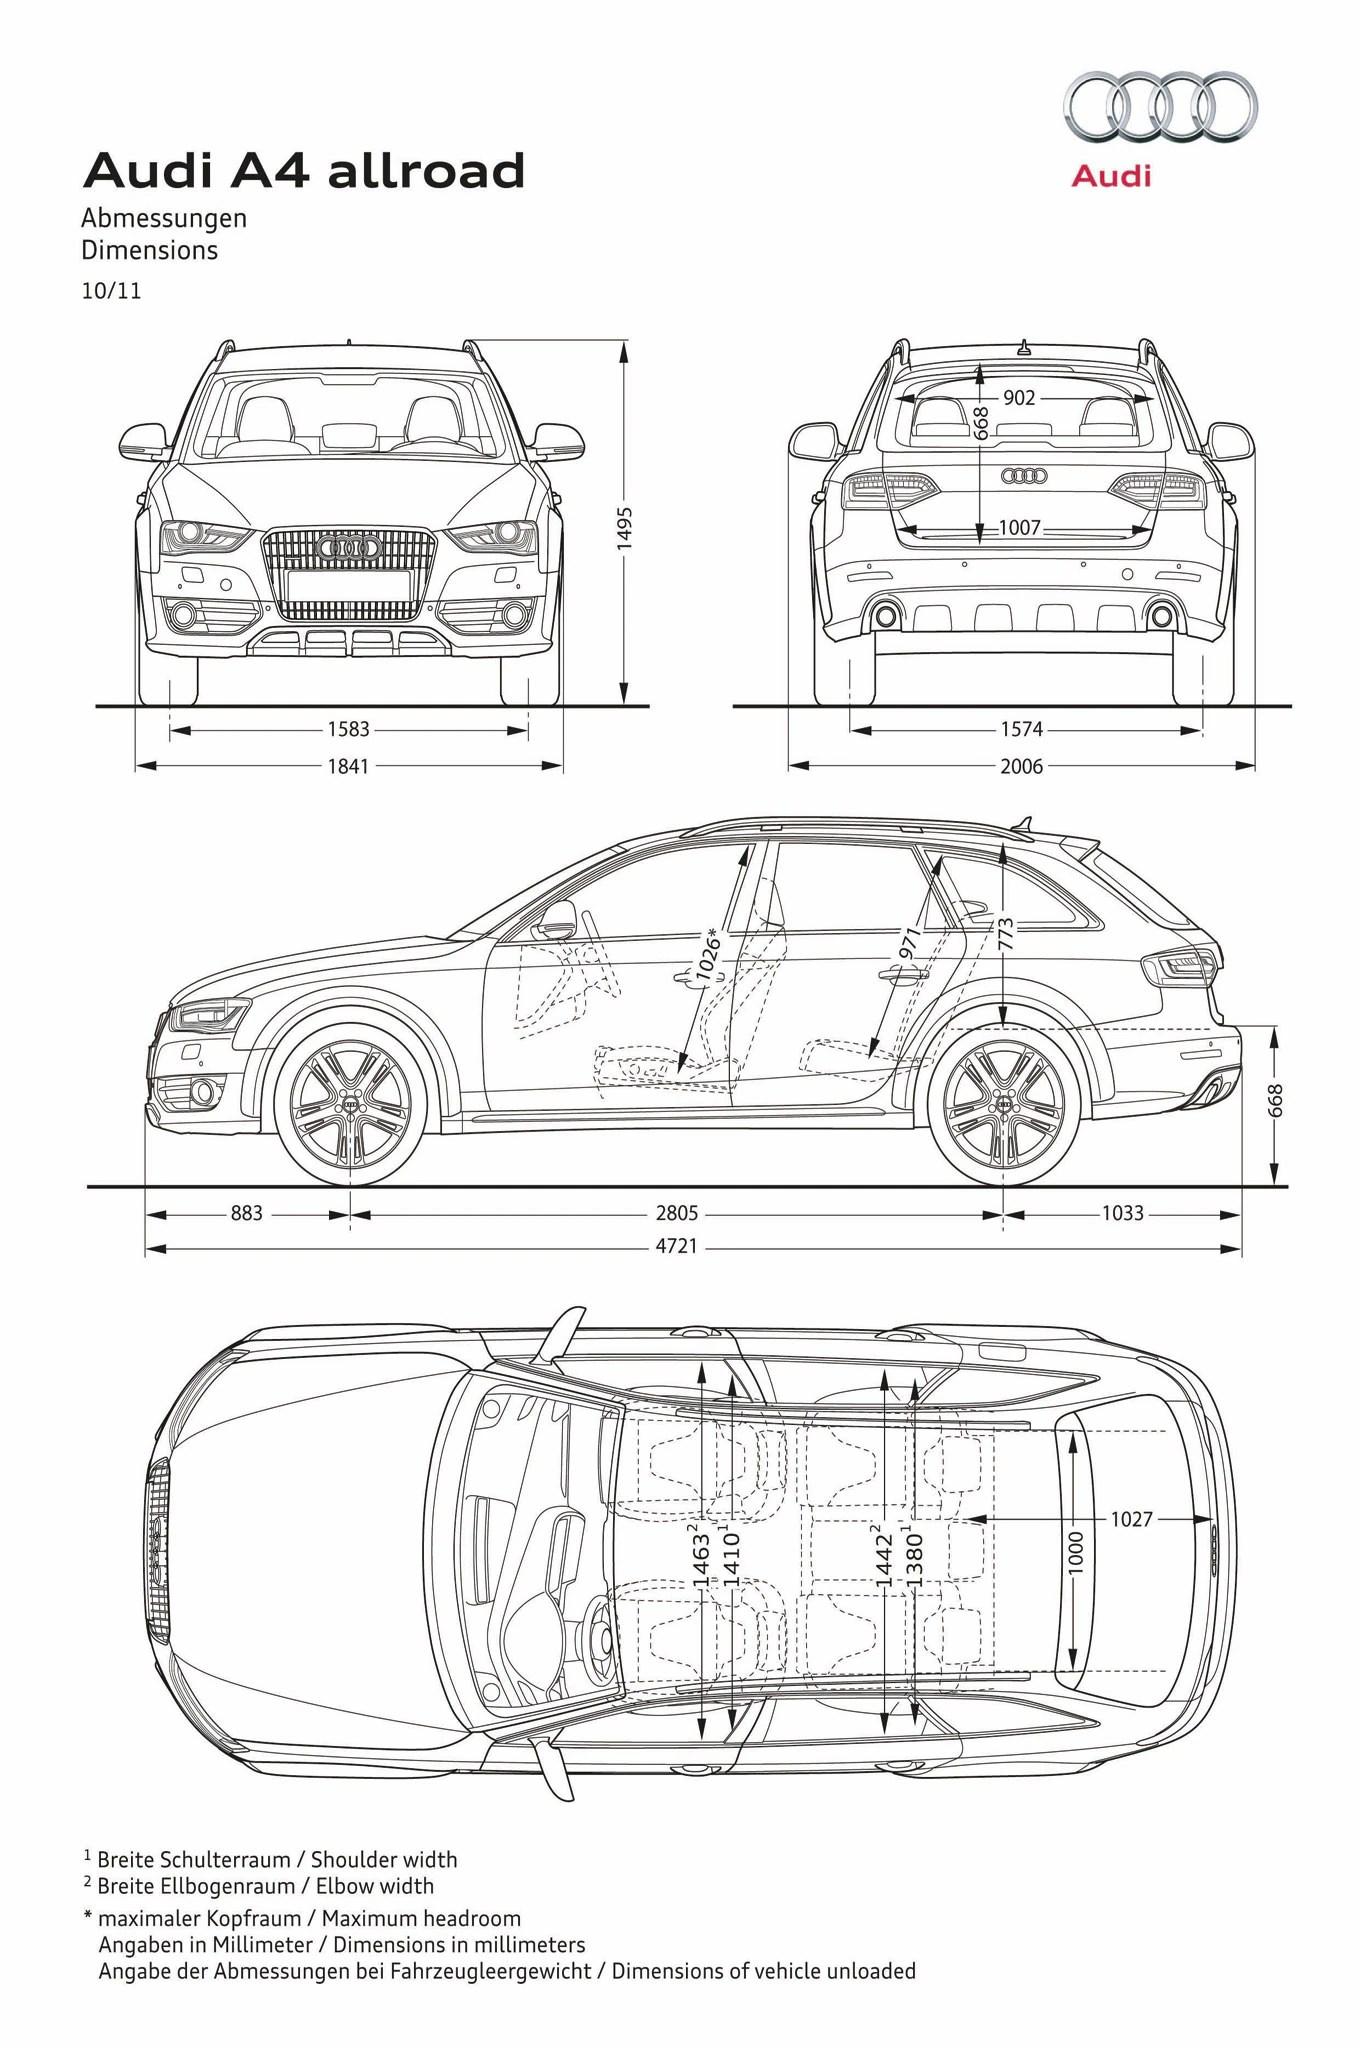 Excellent Audi 1998 A6 Quatro Transmission Wiring Harness Diagrame ...